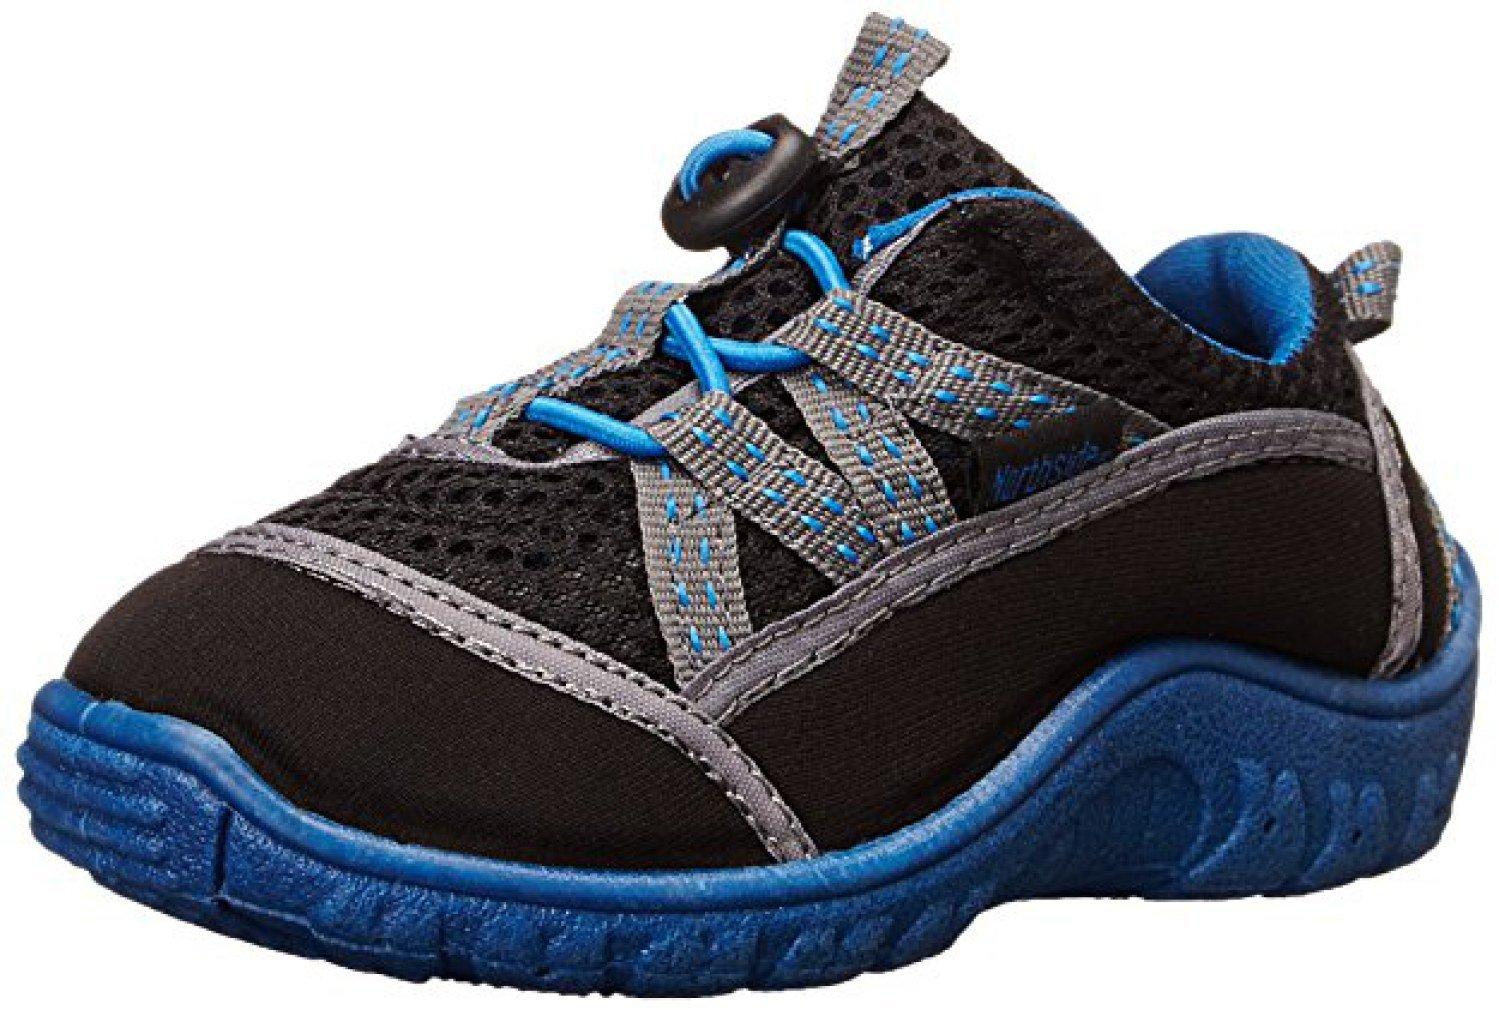 Northside Kid's Brille II Summer Water Shoe, Black/Blue, 7 M US Toddler; with a Waterproof Wet Dry Bag